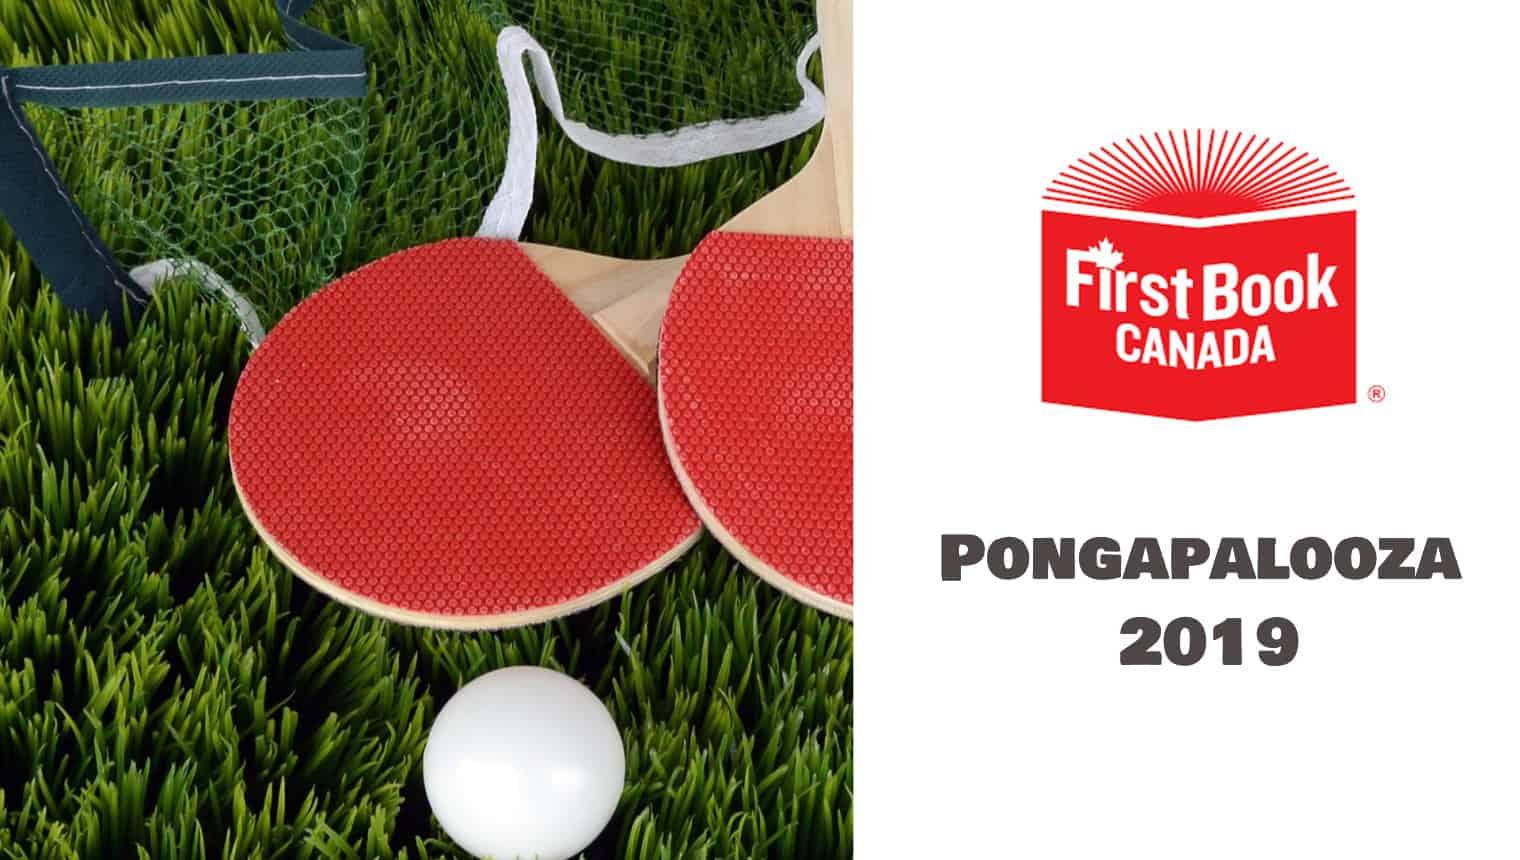 pongapalooza event